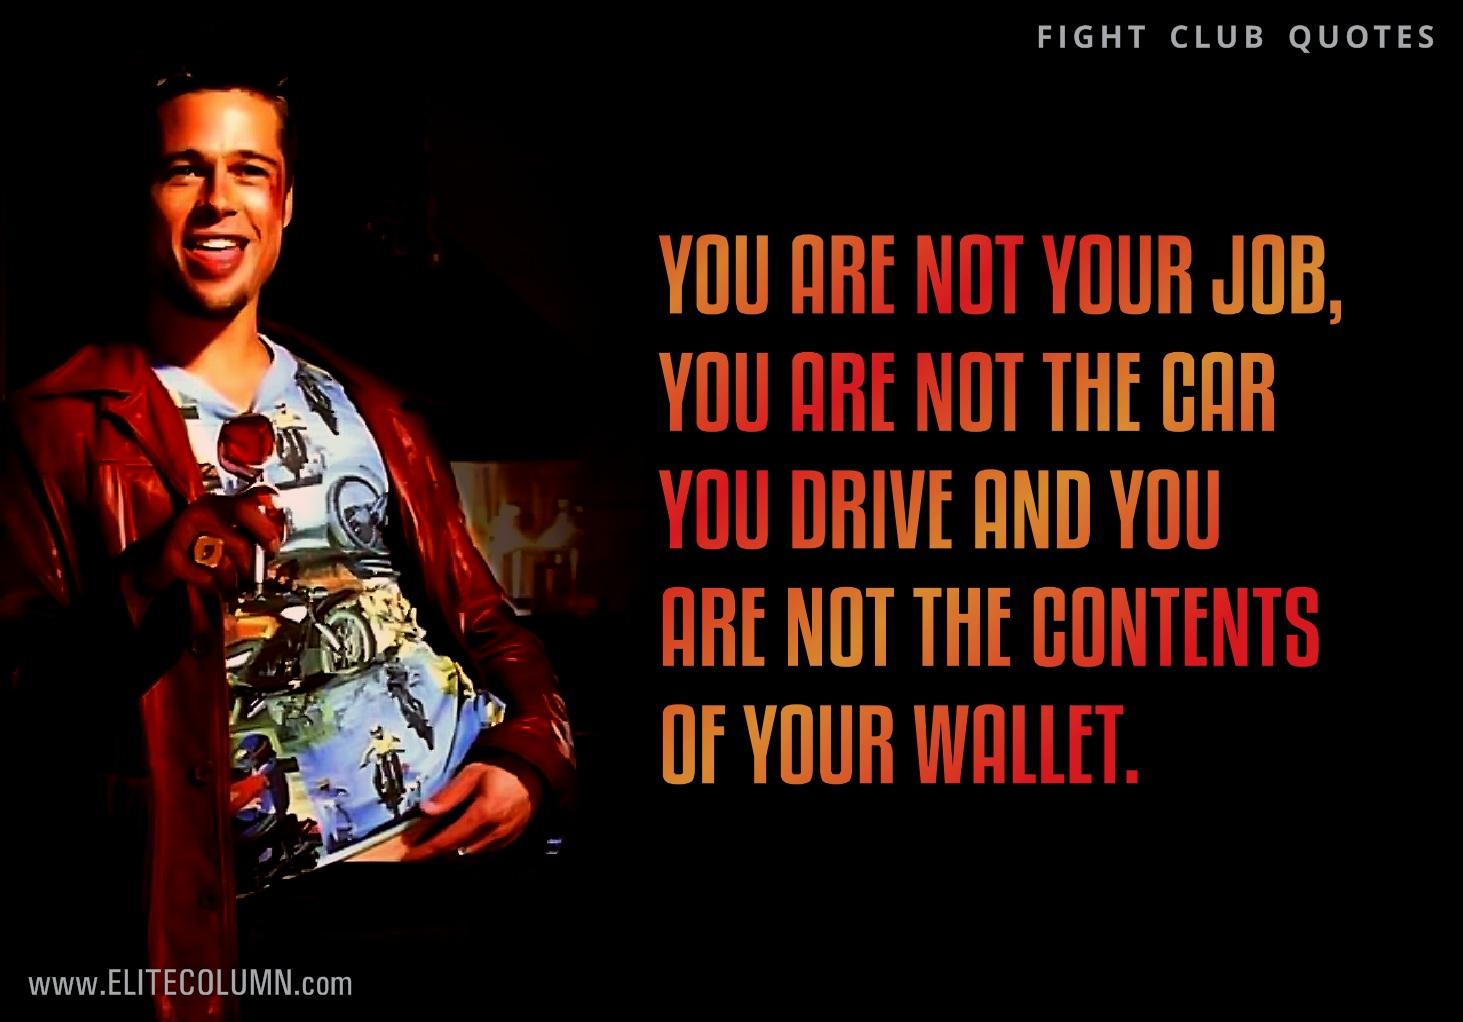 Fight Club Quotes (7)